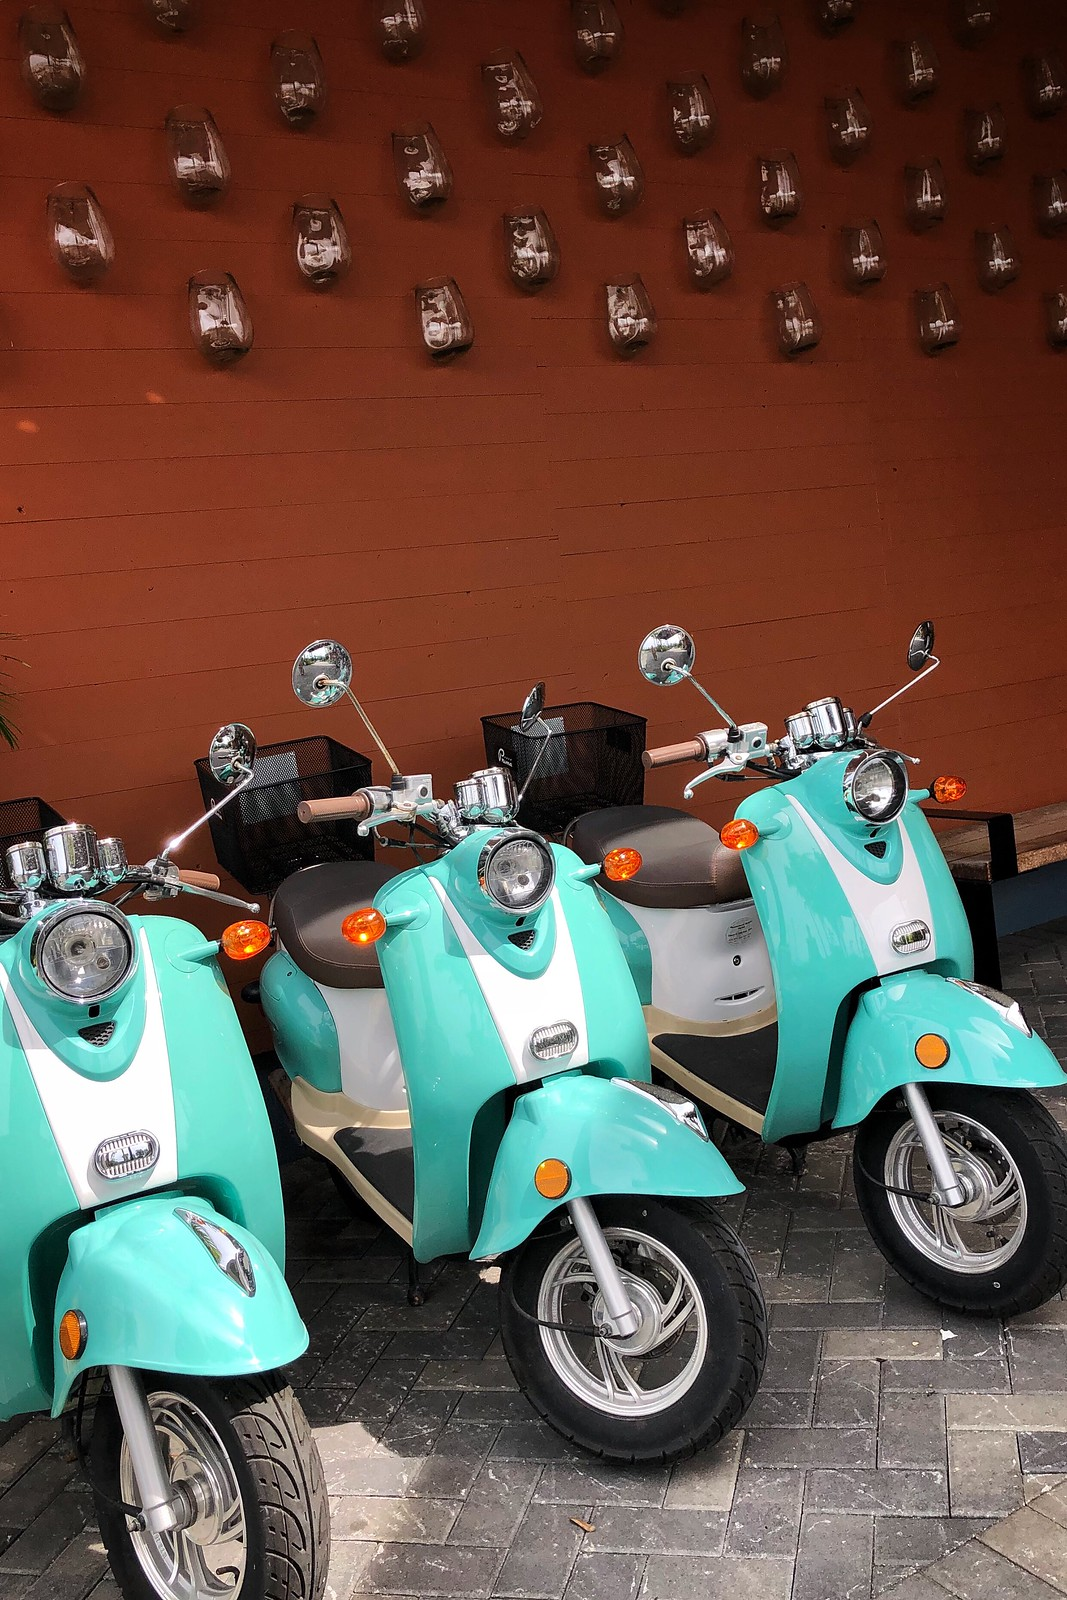 perry-hotel-stock-island-scooters-ultimate-road-trip-5-days-florida-keys-itinerary-what-to-do-key-west-key-largo-islamorada-marathon-miami-vacation-guide